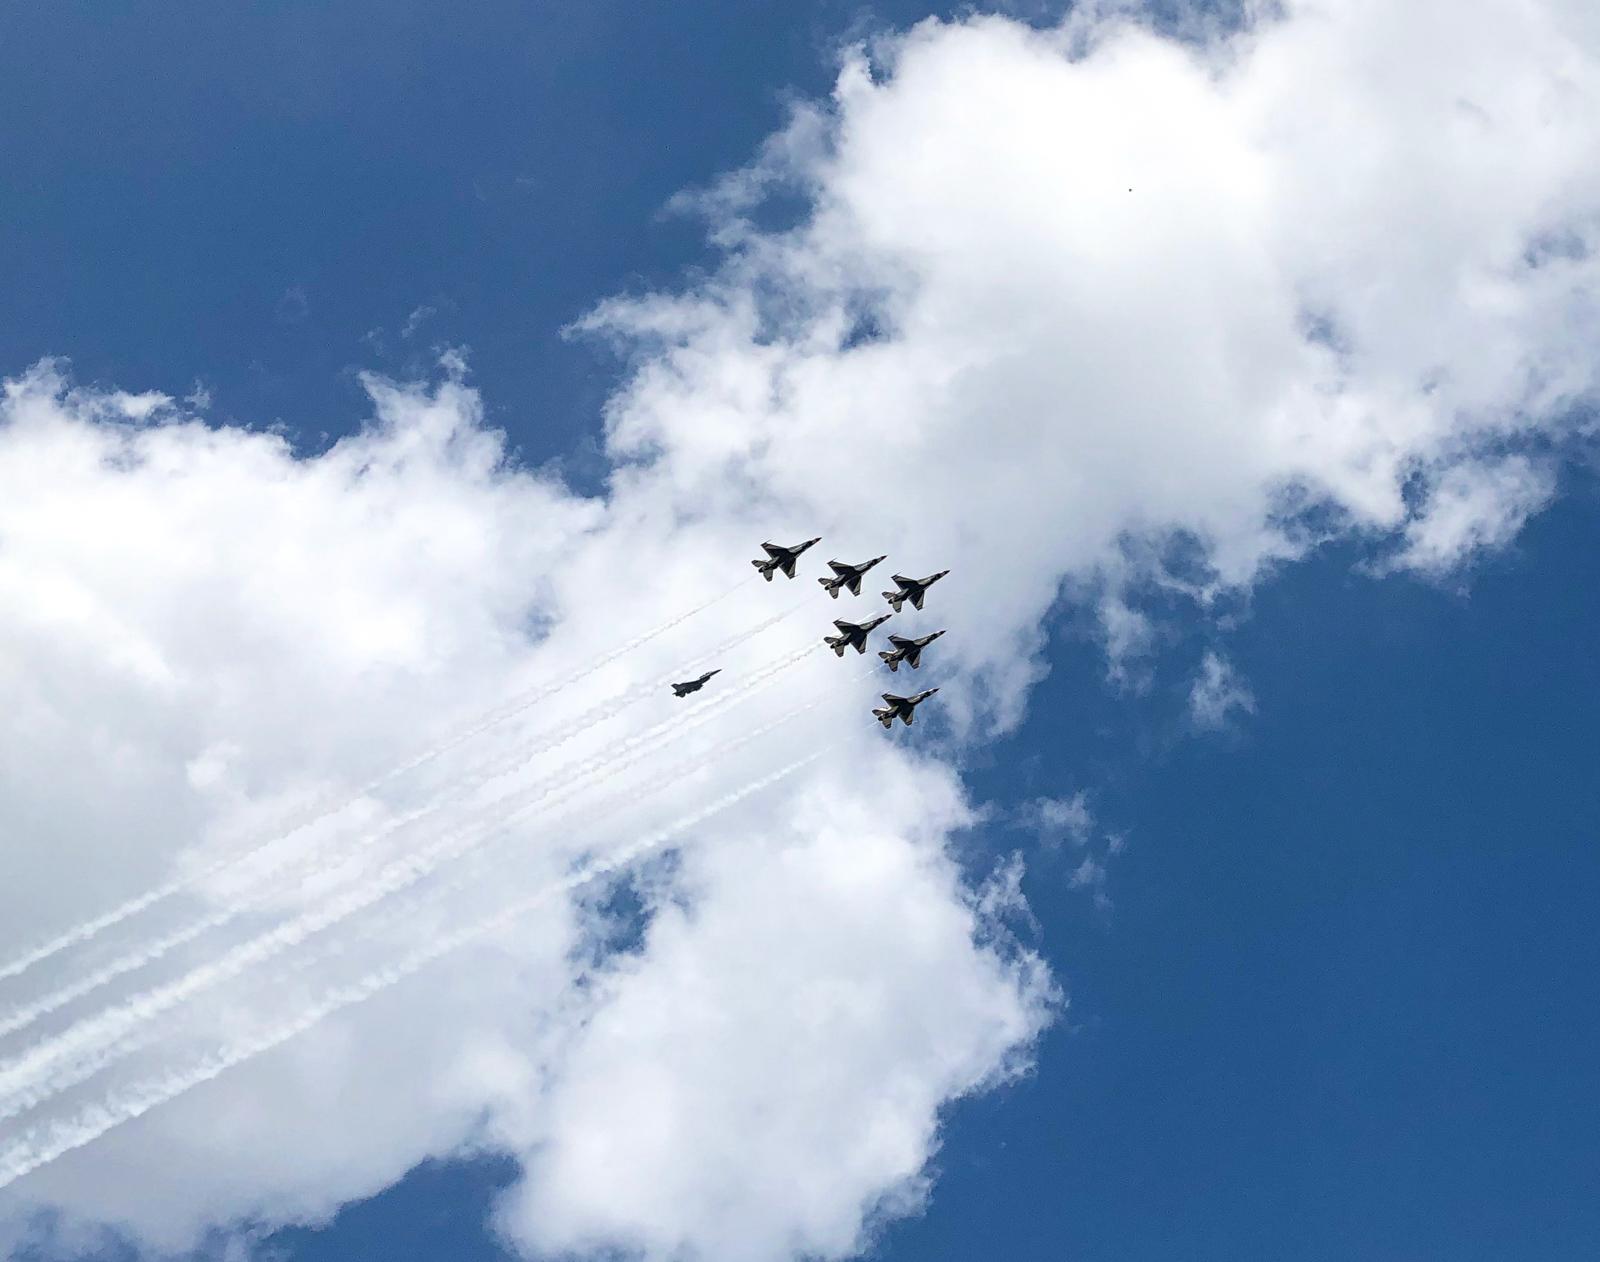 Thunderbirds flyover